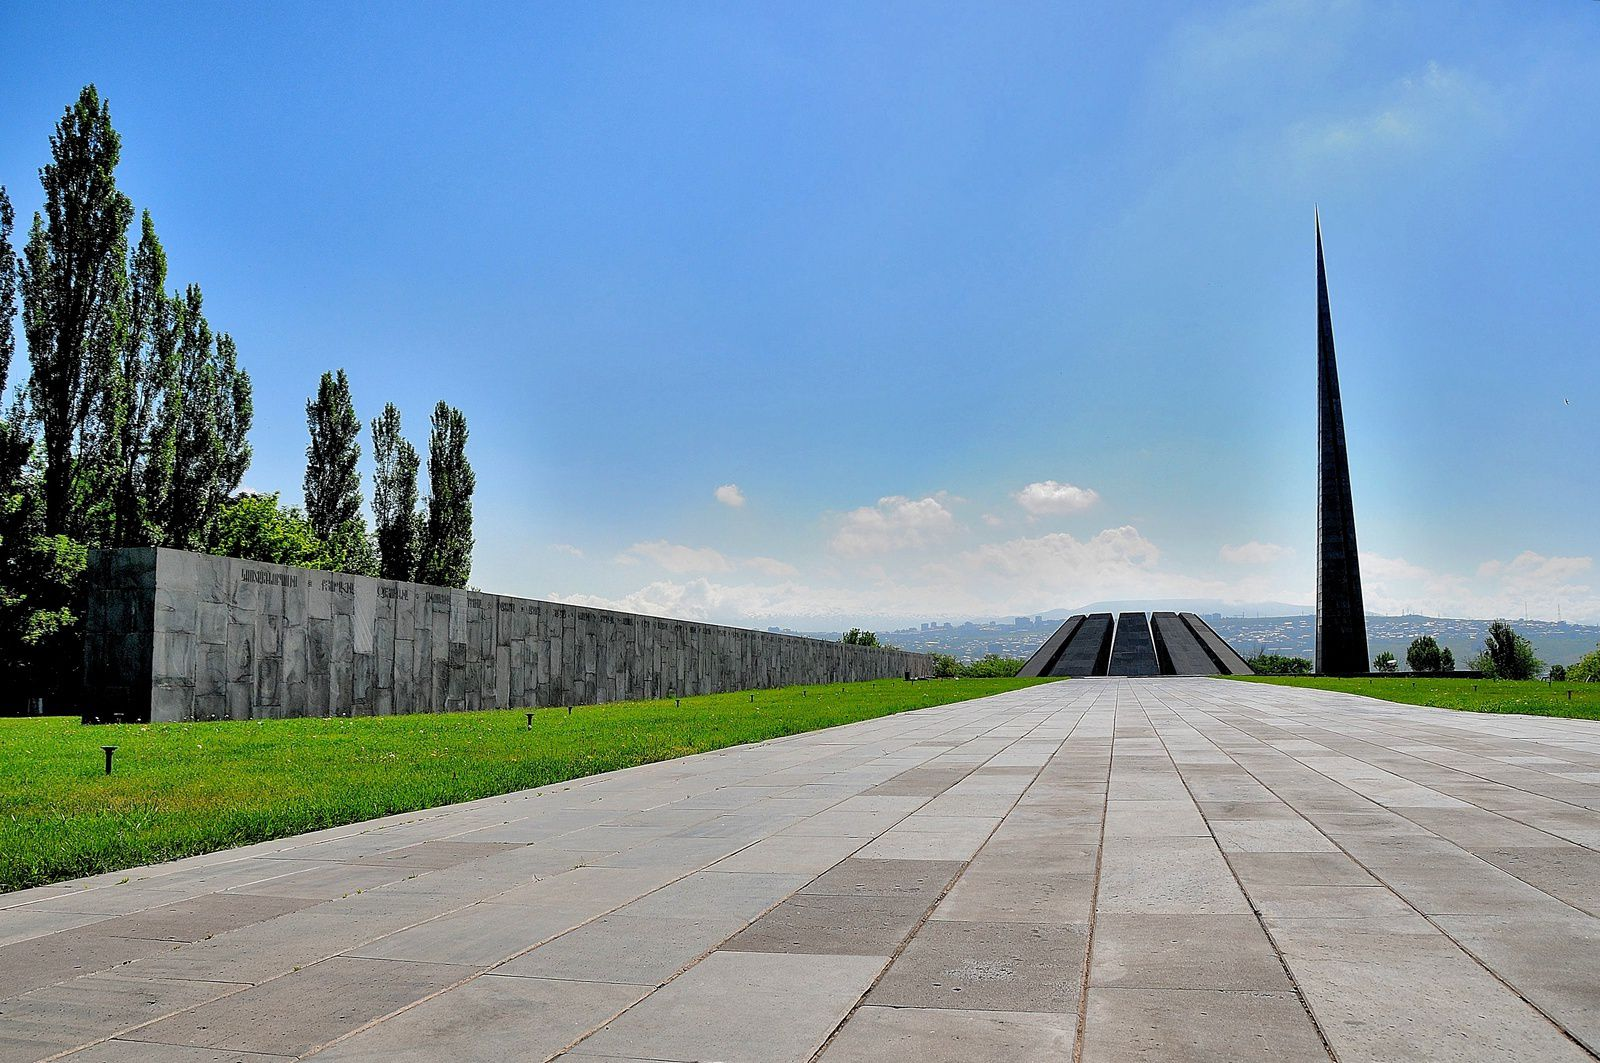 11ème Jour - MEMORIAL DU GENOCIDE YEREVAN -  Article 079